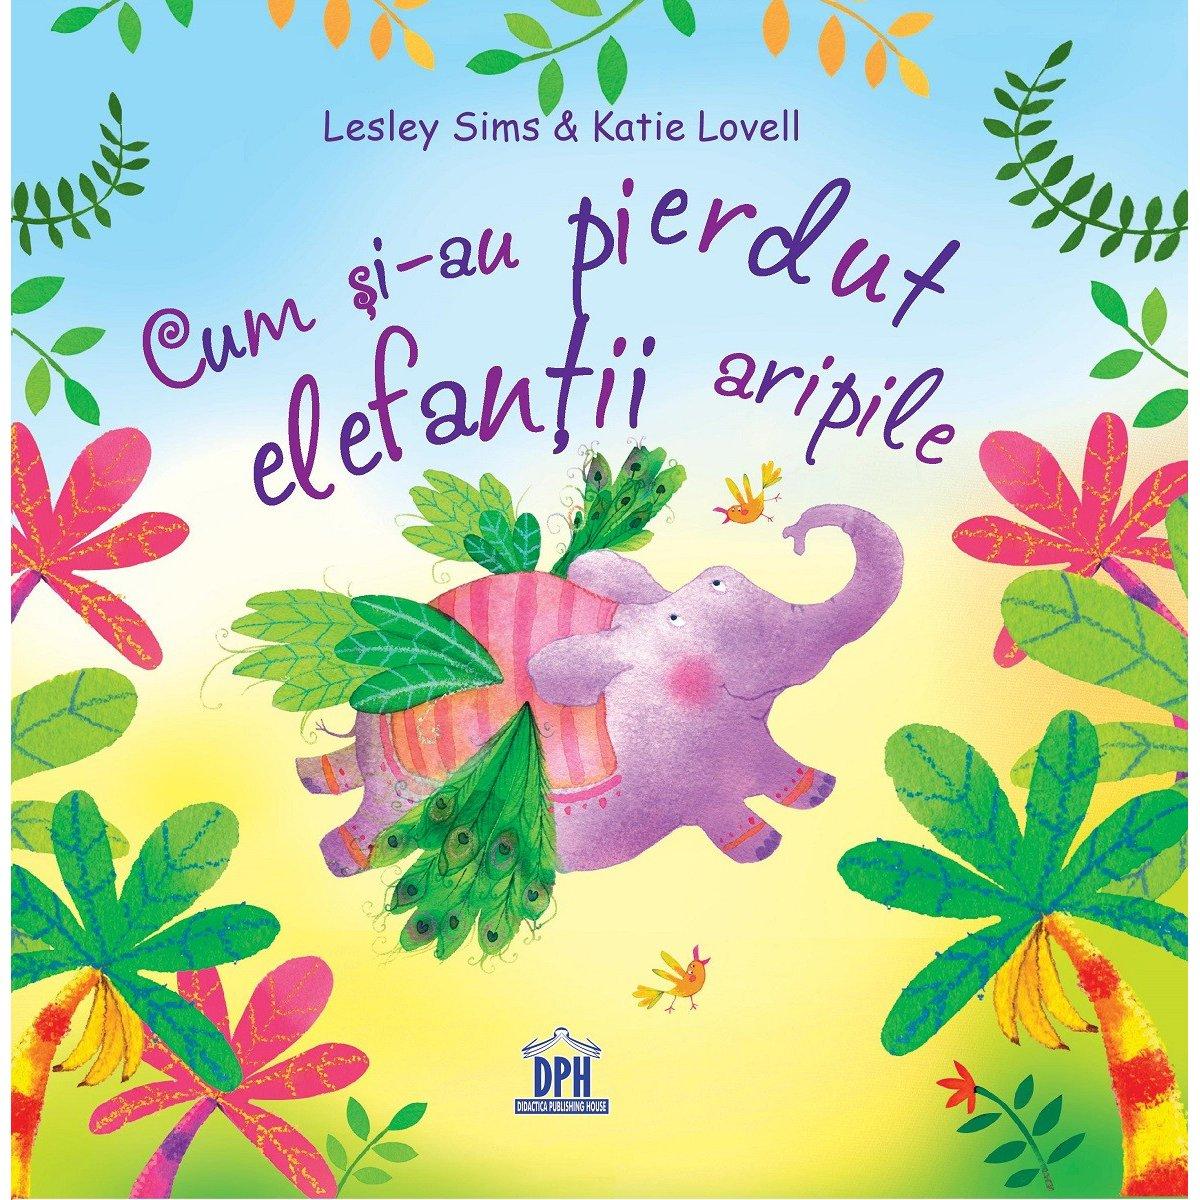 Carte Cum si-au pierdut elefantii aripile, Editura DPH